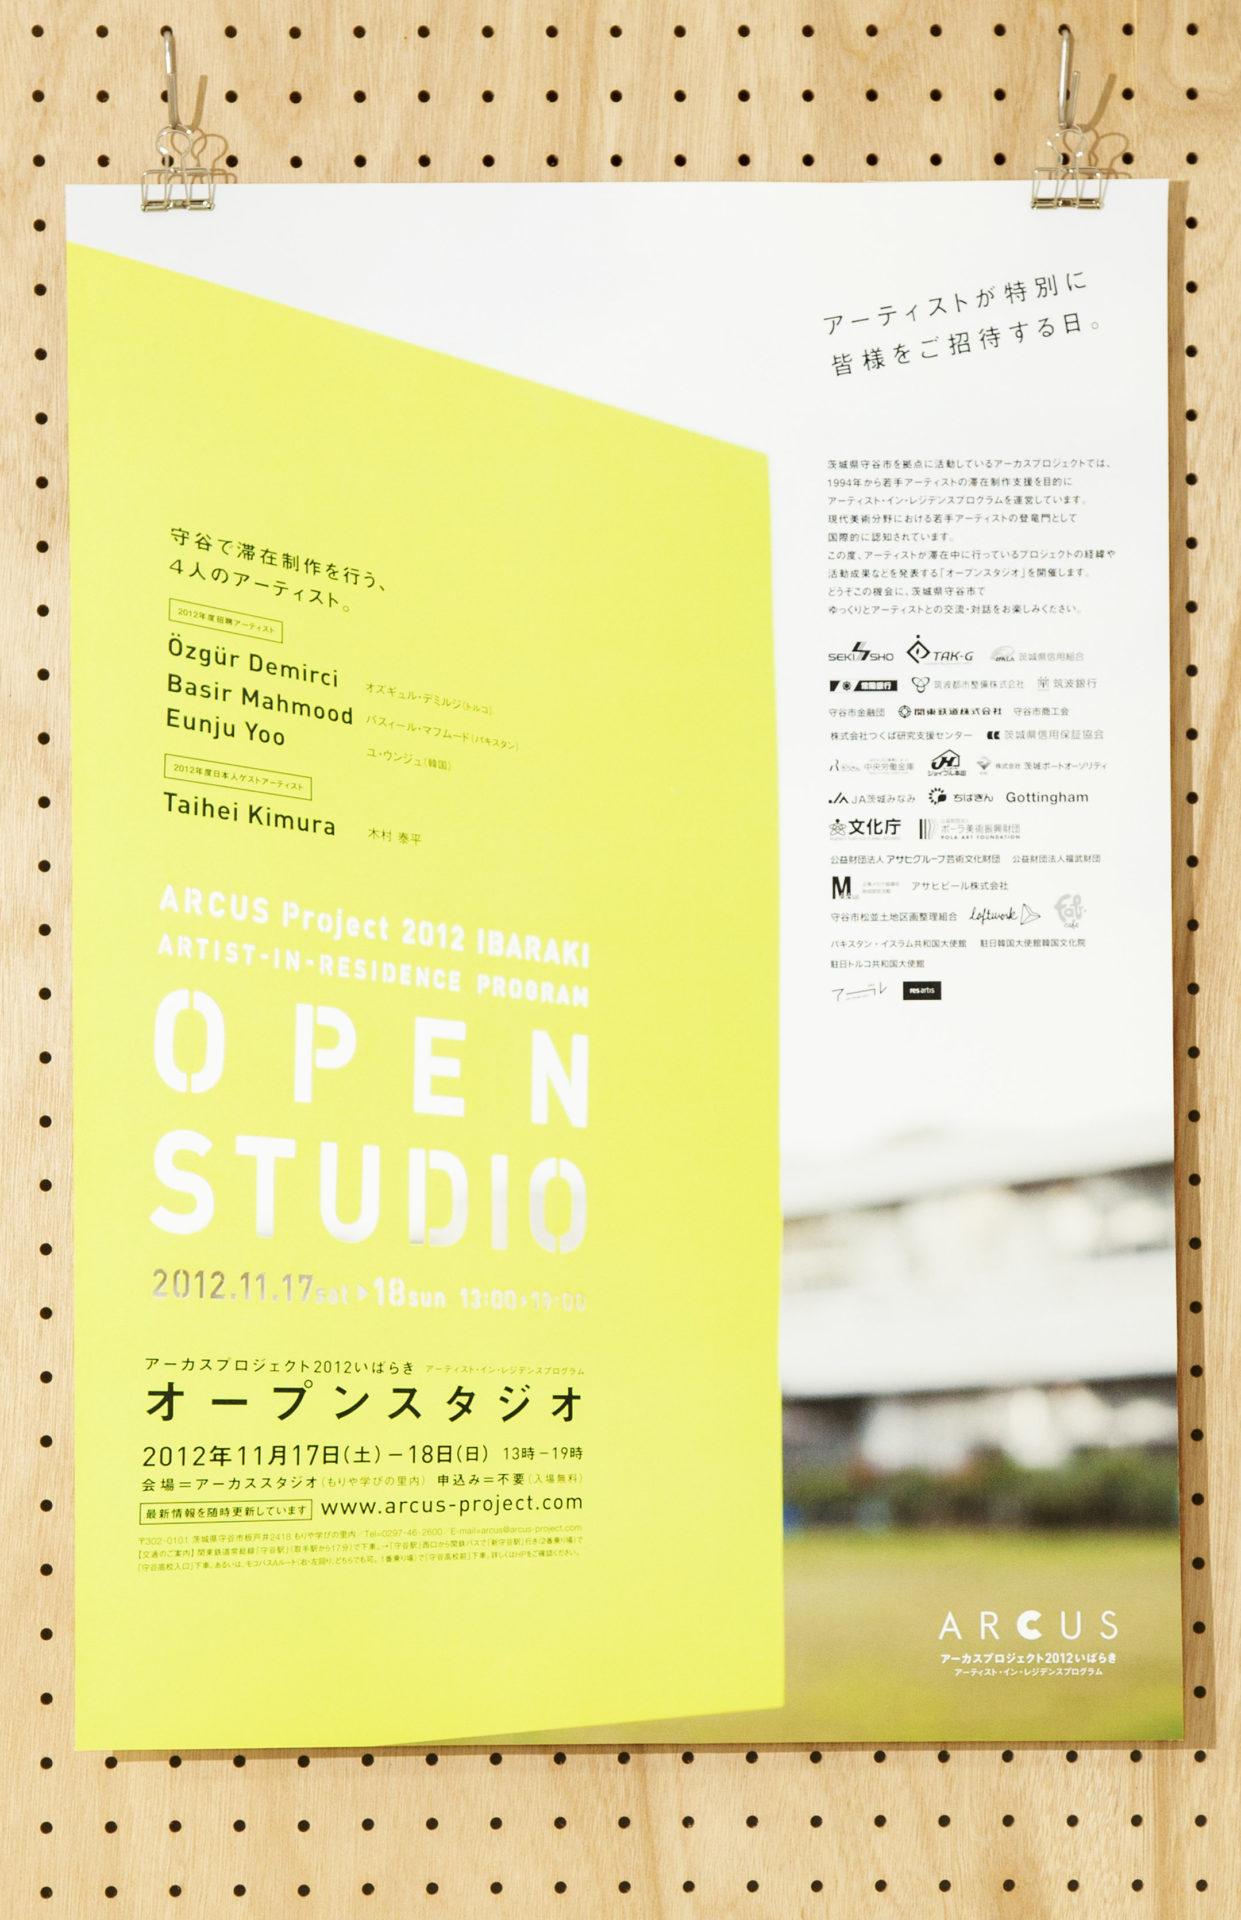 ARCUS  オープンスタジオ